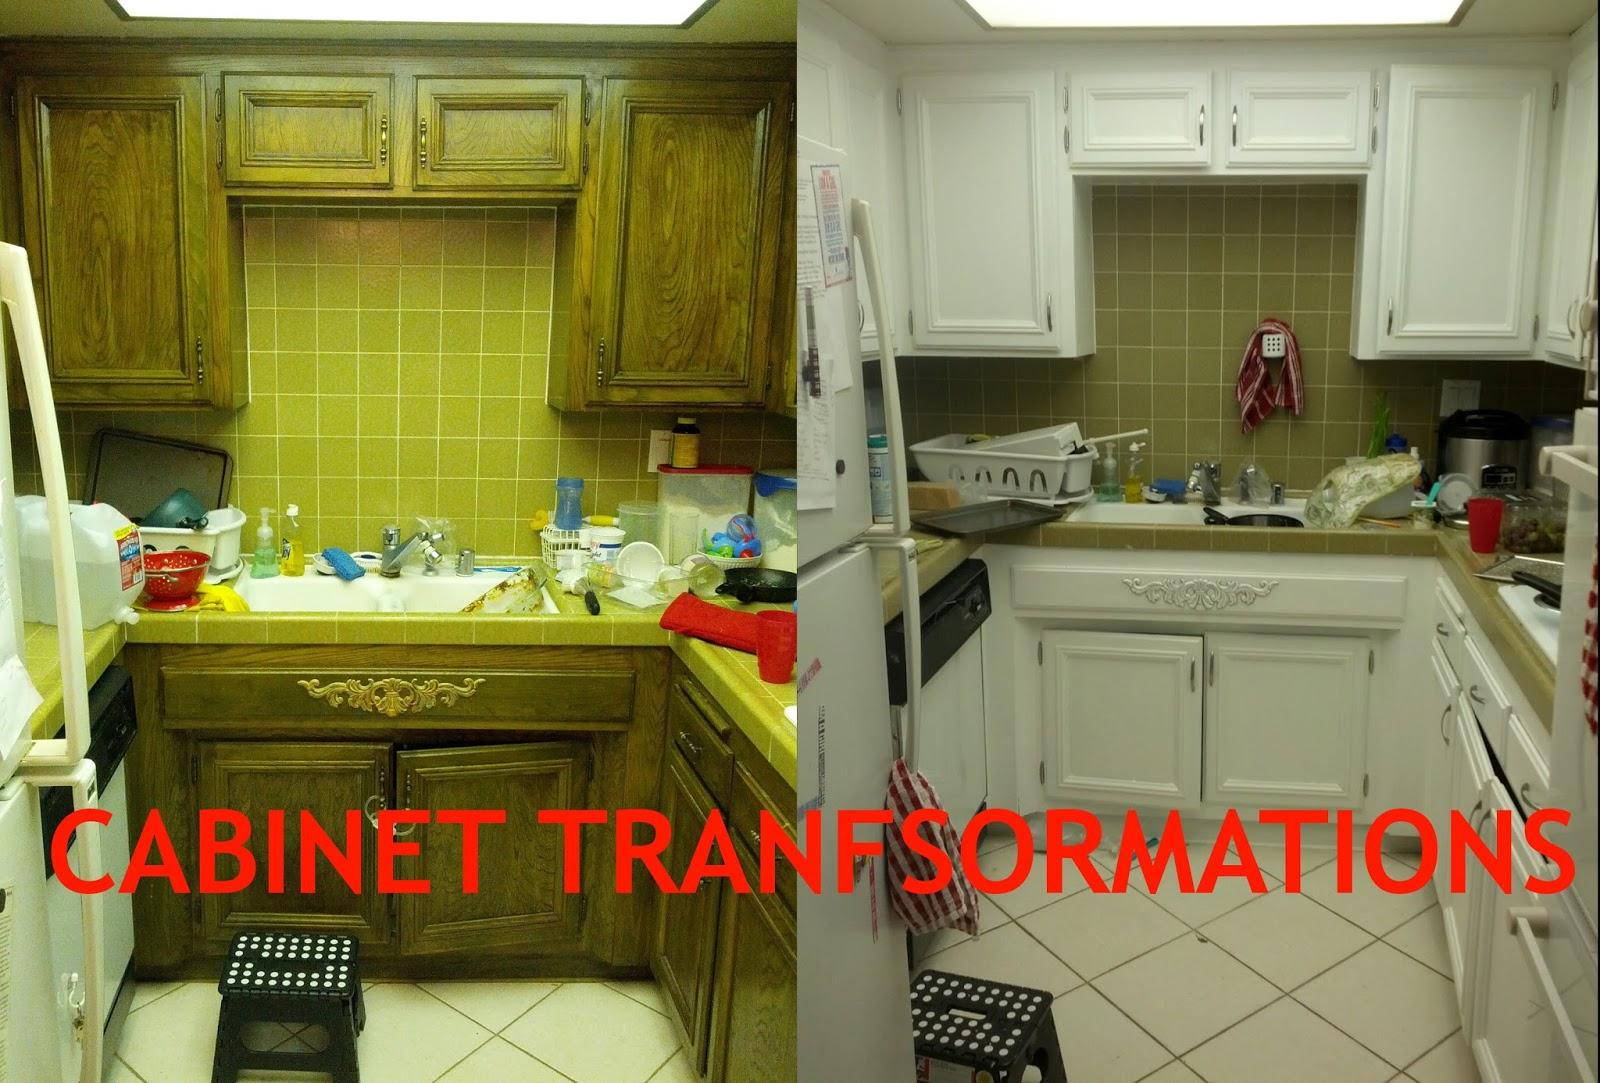 rustoleum cabinet transformations instructions